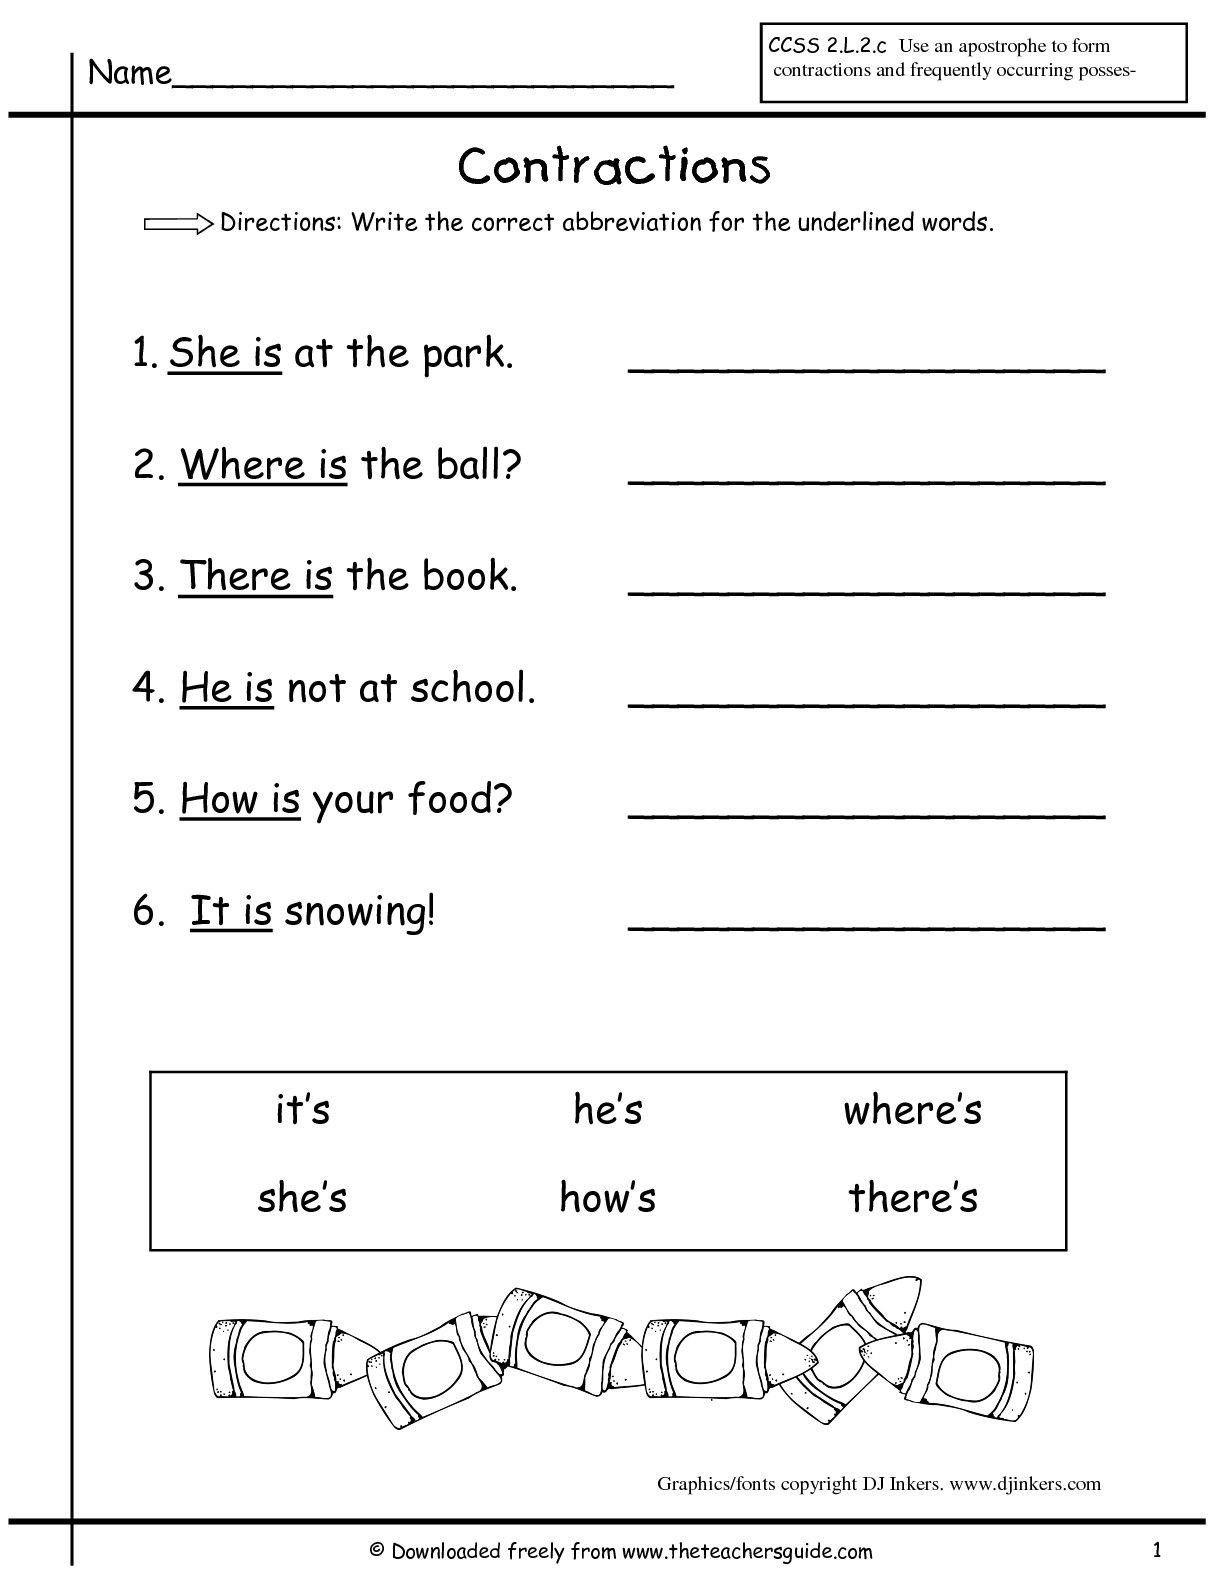 medium resolution of Free Earth Science Worksheets Inspirational Science Worksheets for Grade to  Print Free Printable B…   Biology worksheet